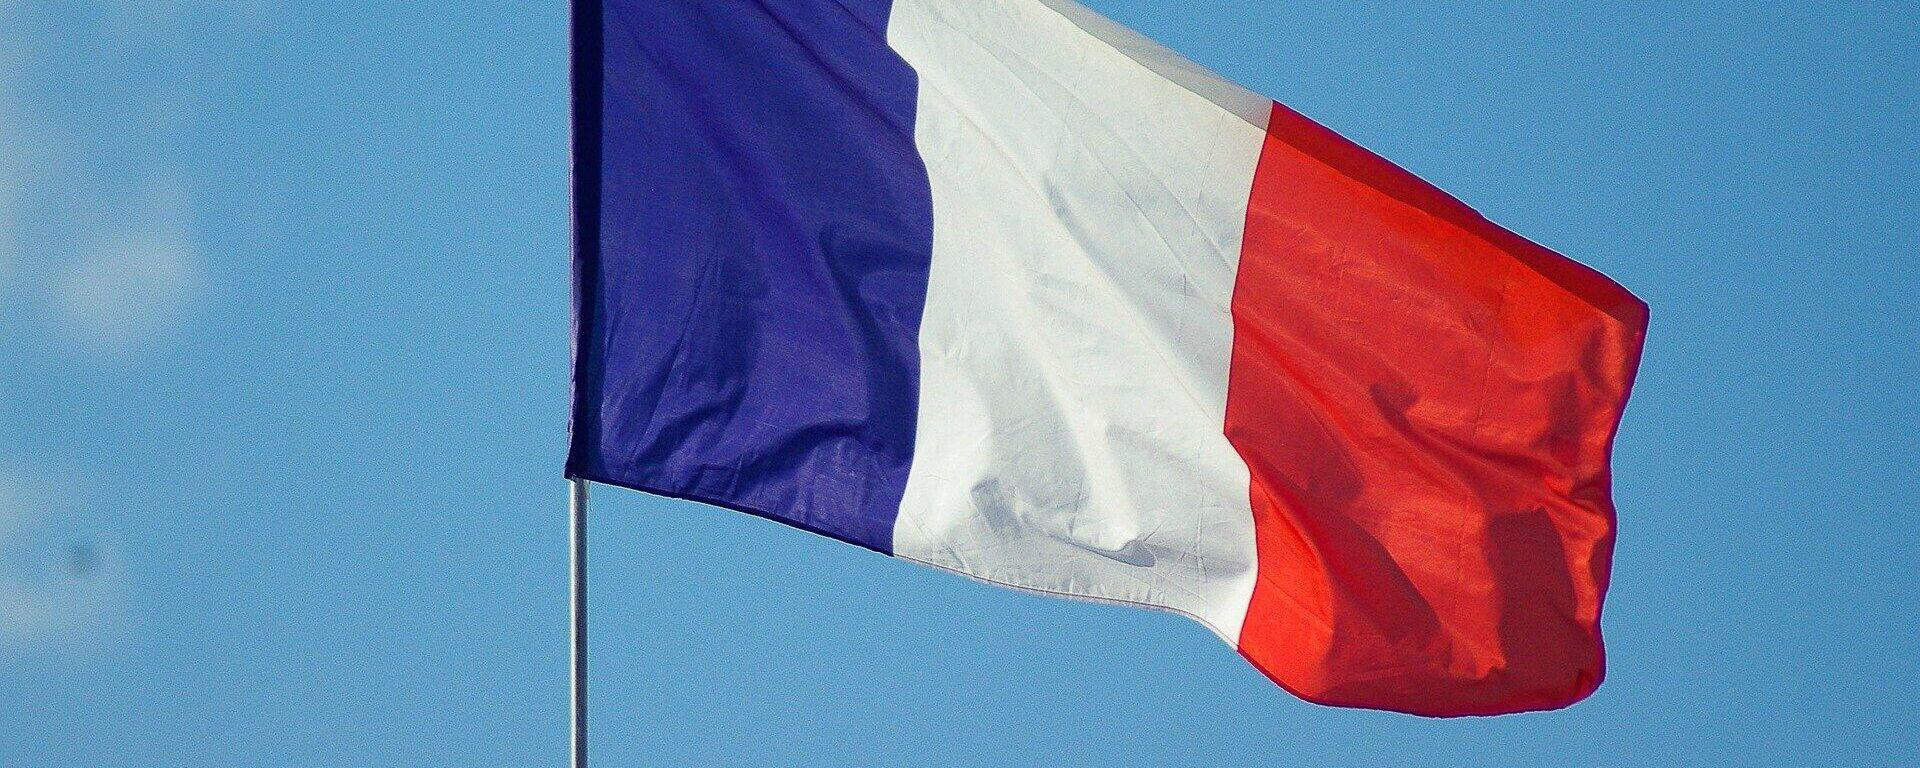 Frankreichs Flagge (Symbolbild) - SNA, 1920, 18.09.2021